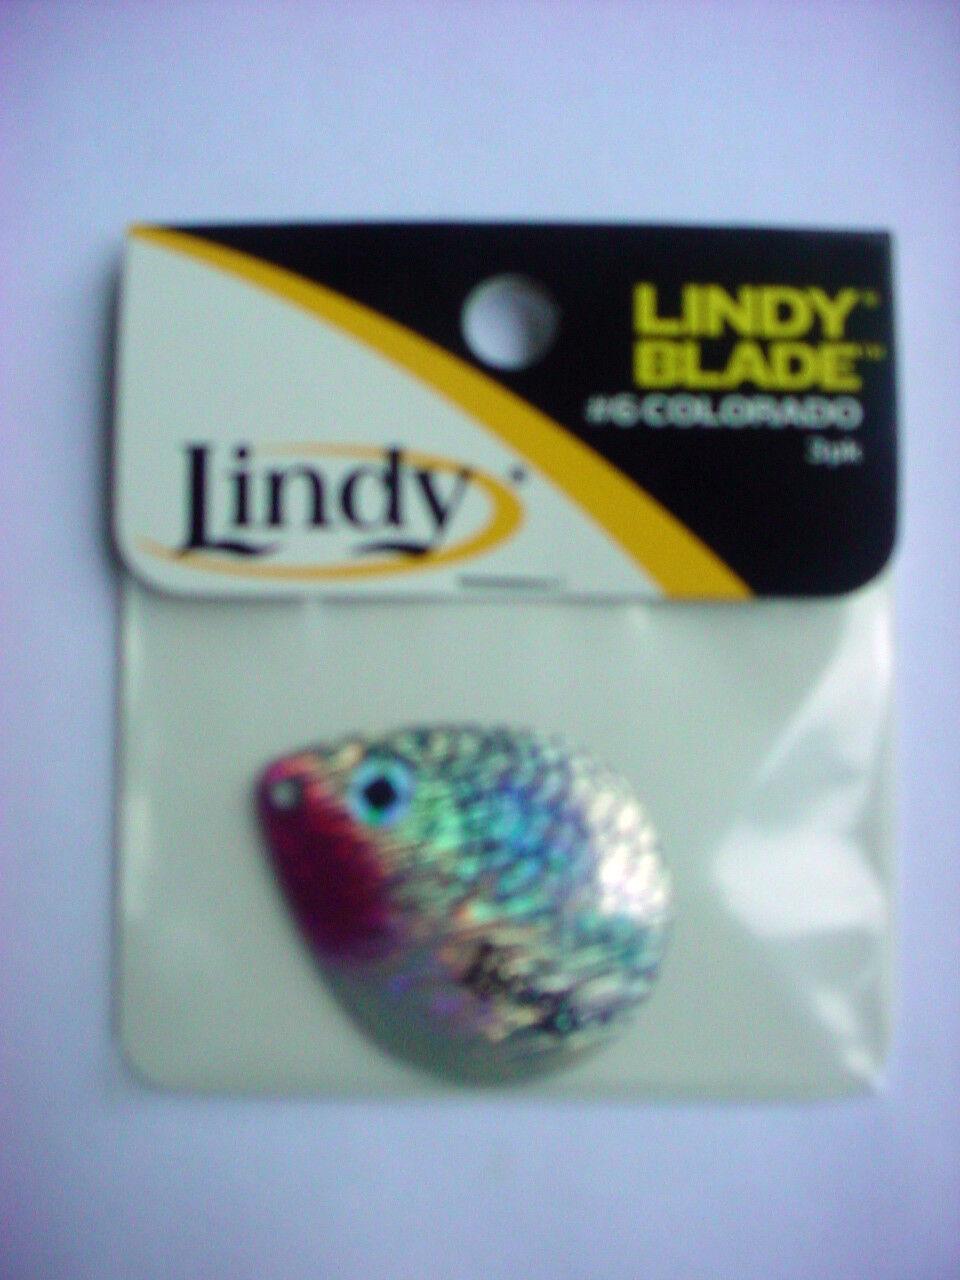 6 PACKS LINDY BLADES #3 INDIANA LBI306 SHINER 3 PER PACK-18 TOTAL